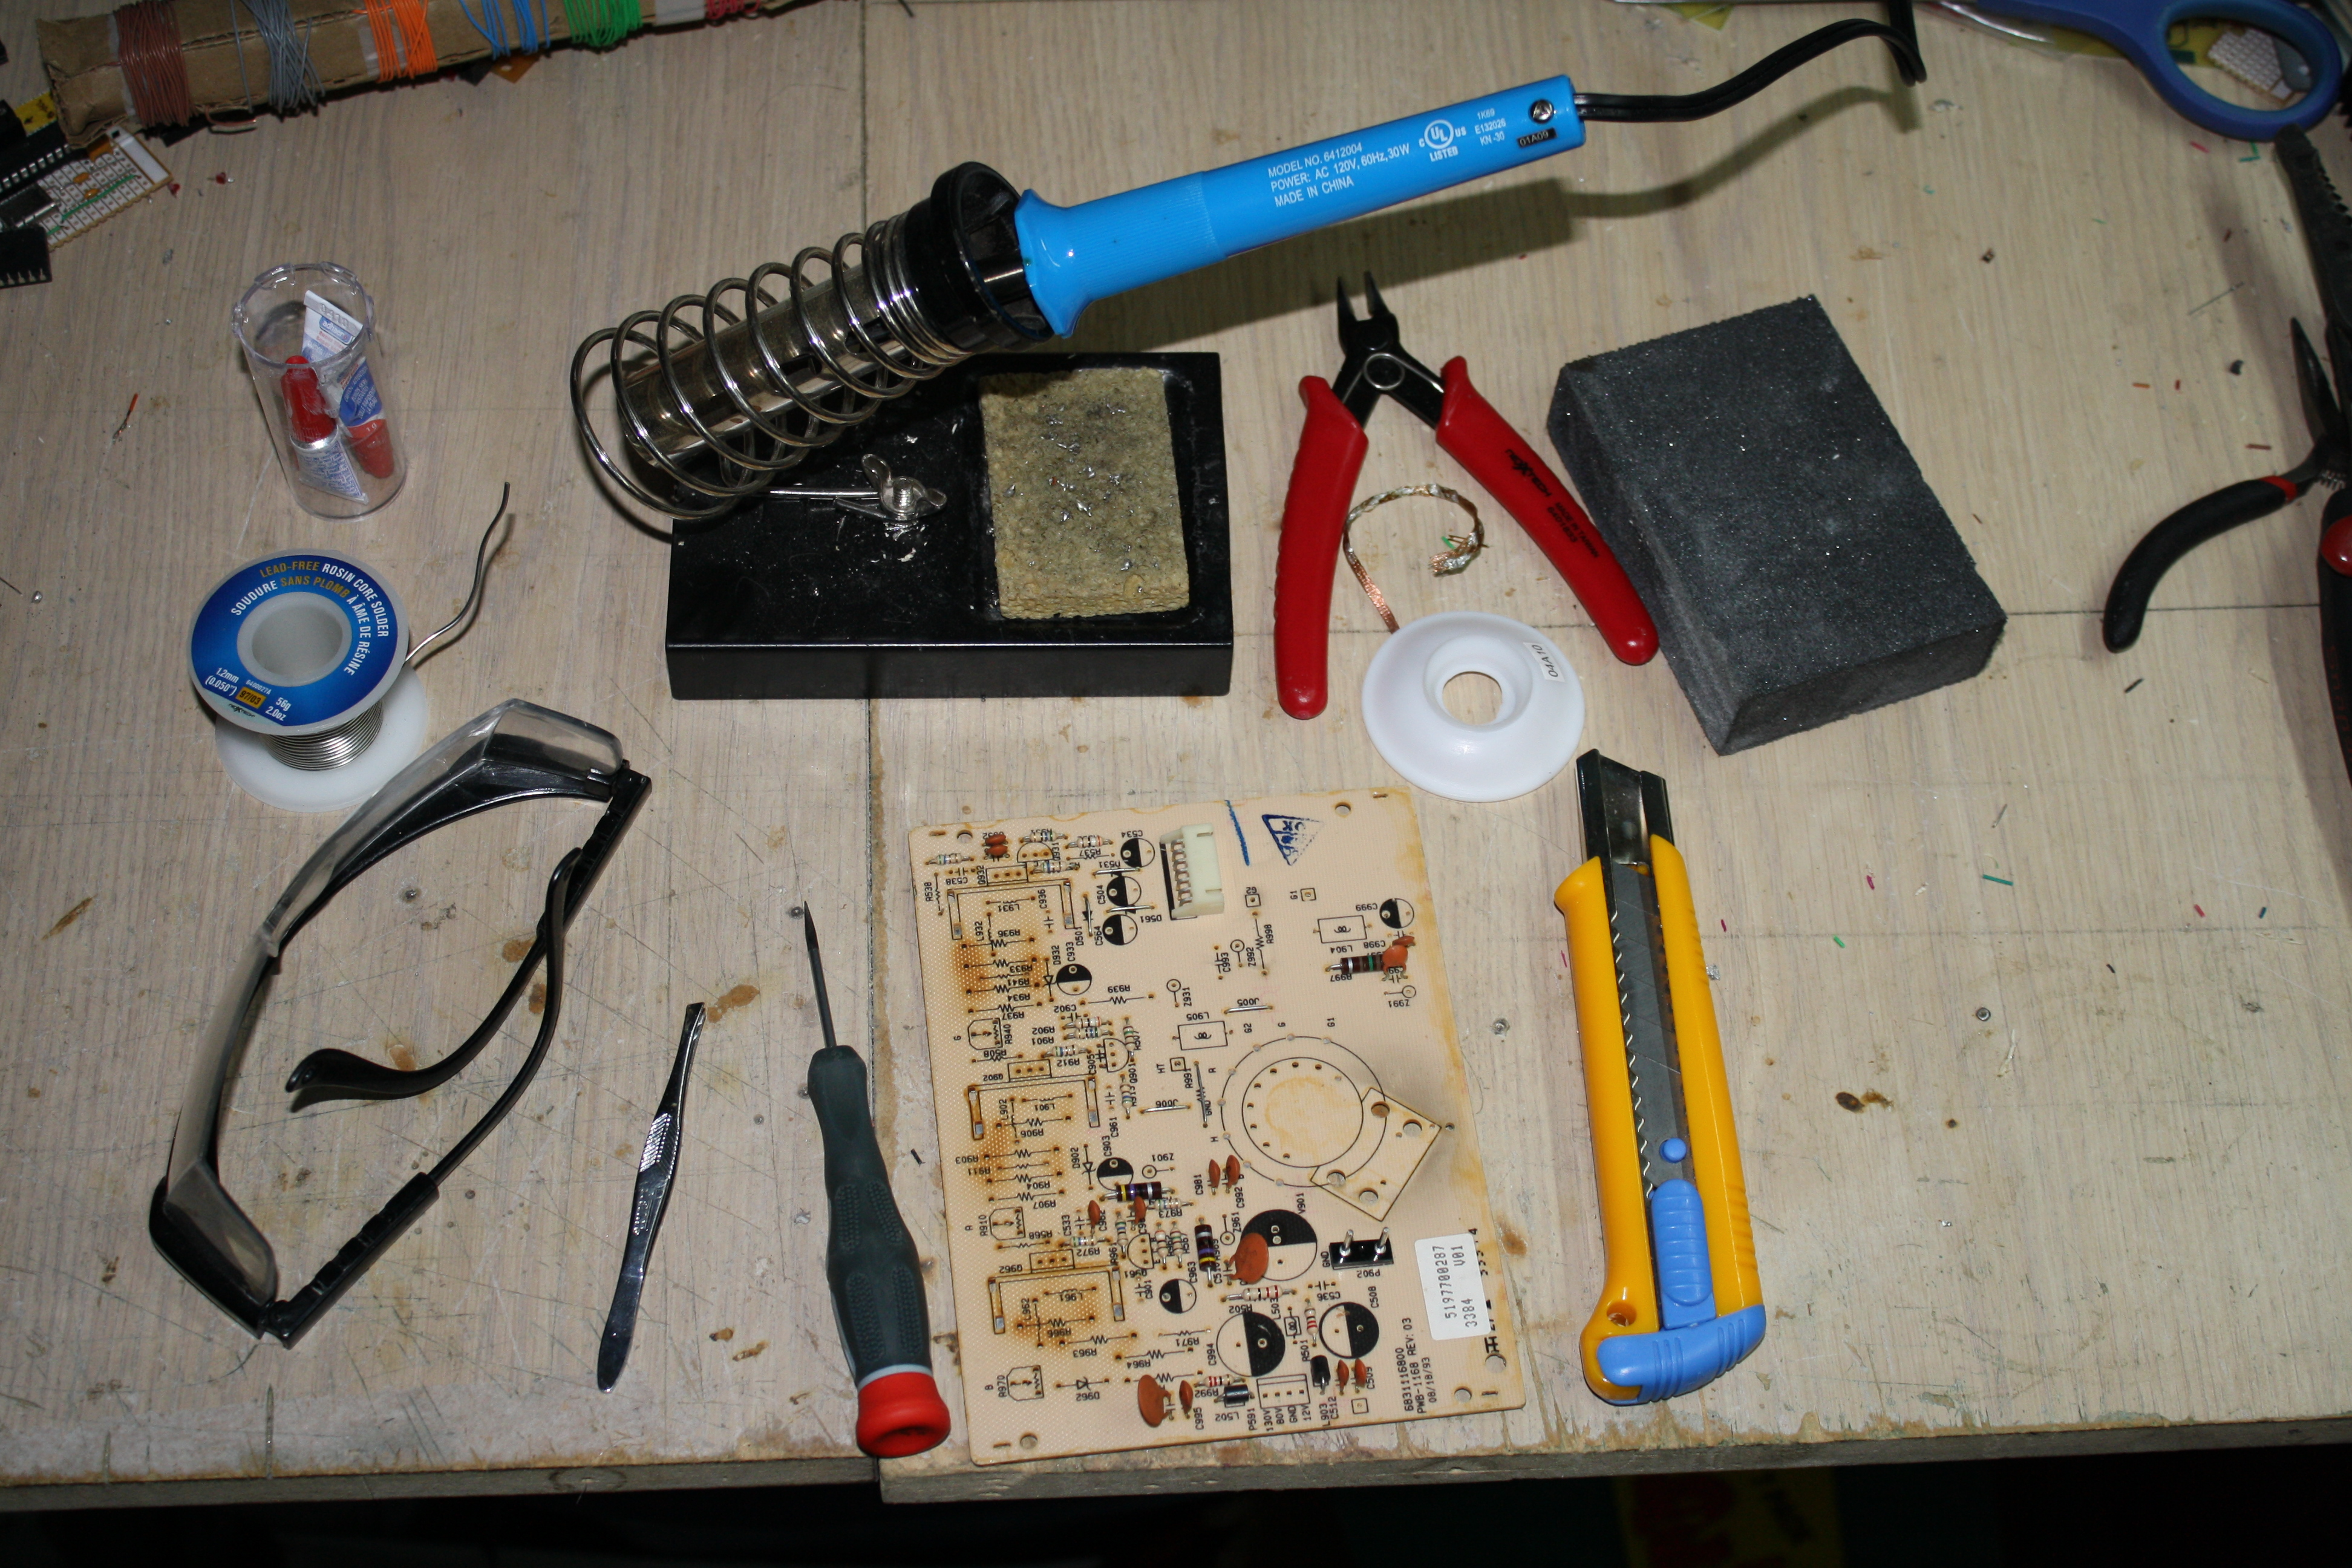 DIY circuit board creation